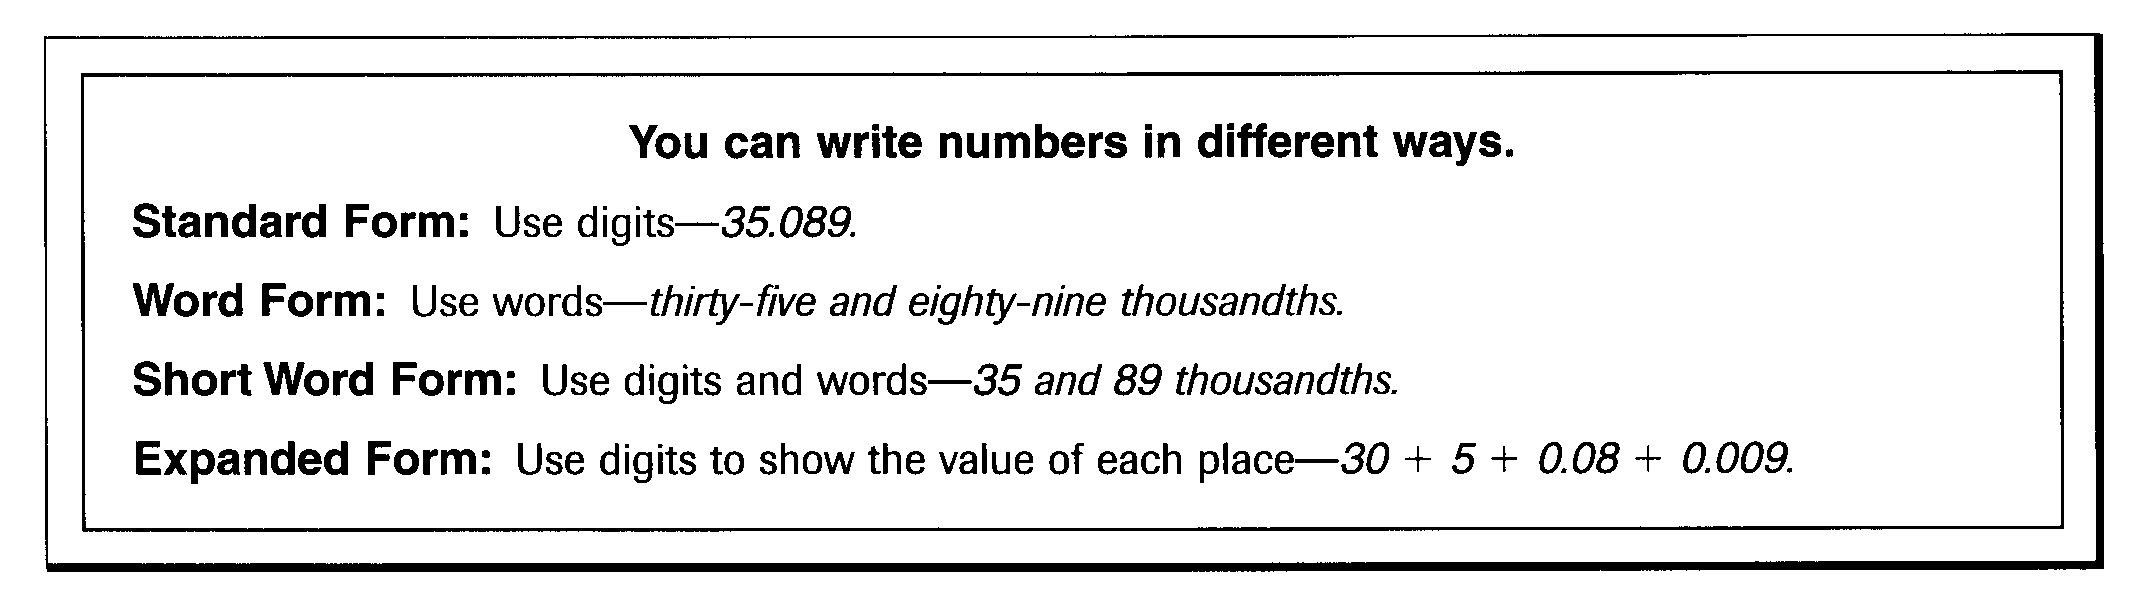 Wallis robert math help number form standard expanded falaconquin